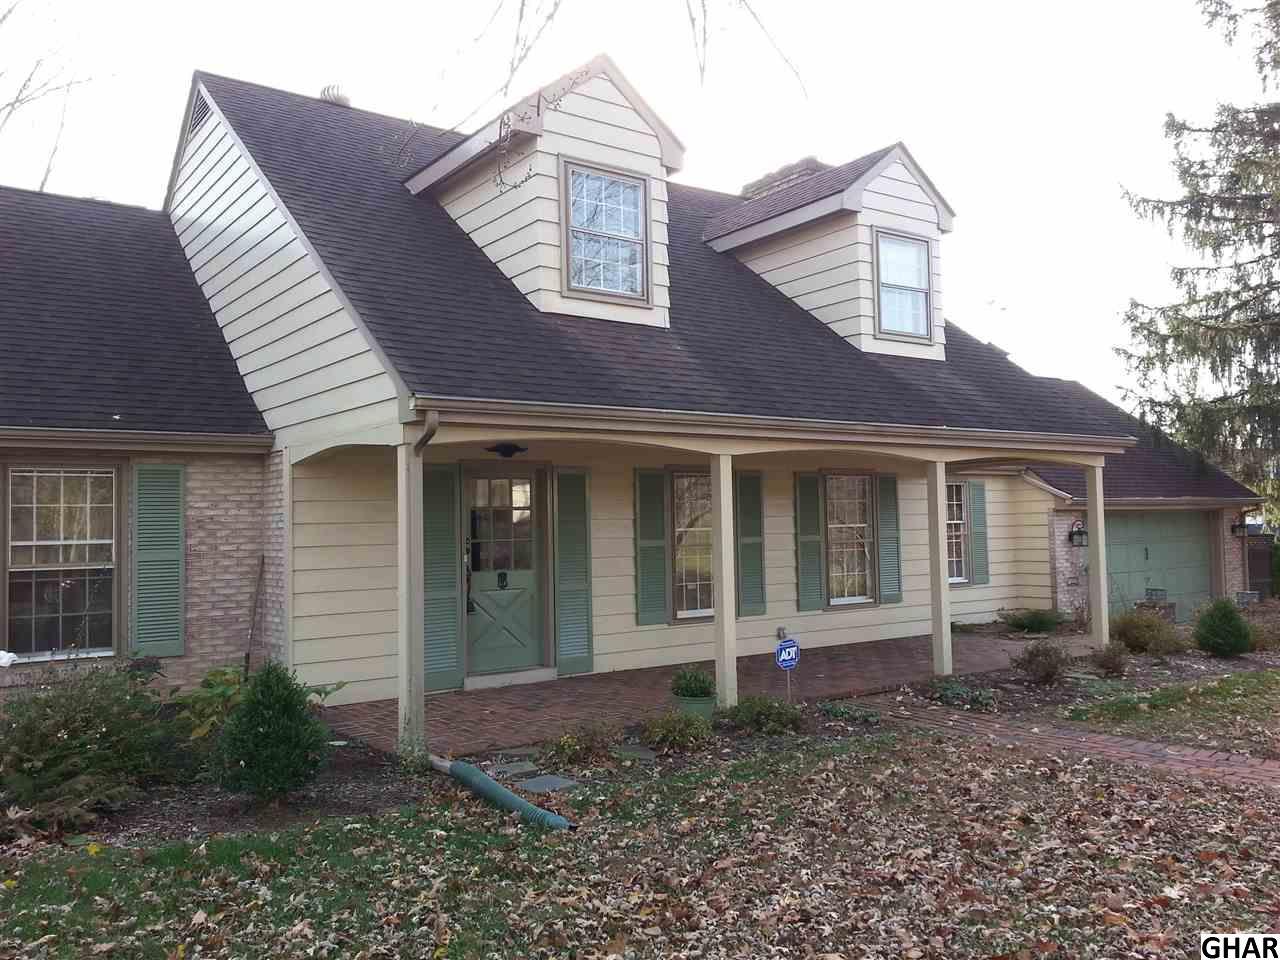 Rental Homes for Rent, ListingId:36289493, location: 40 Woodland Avenue Middletown 17057